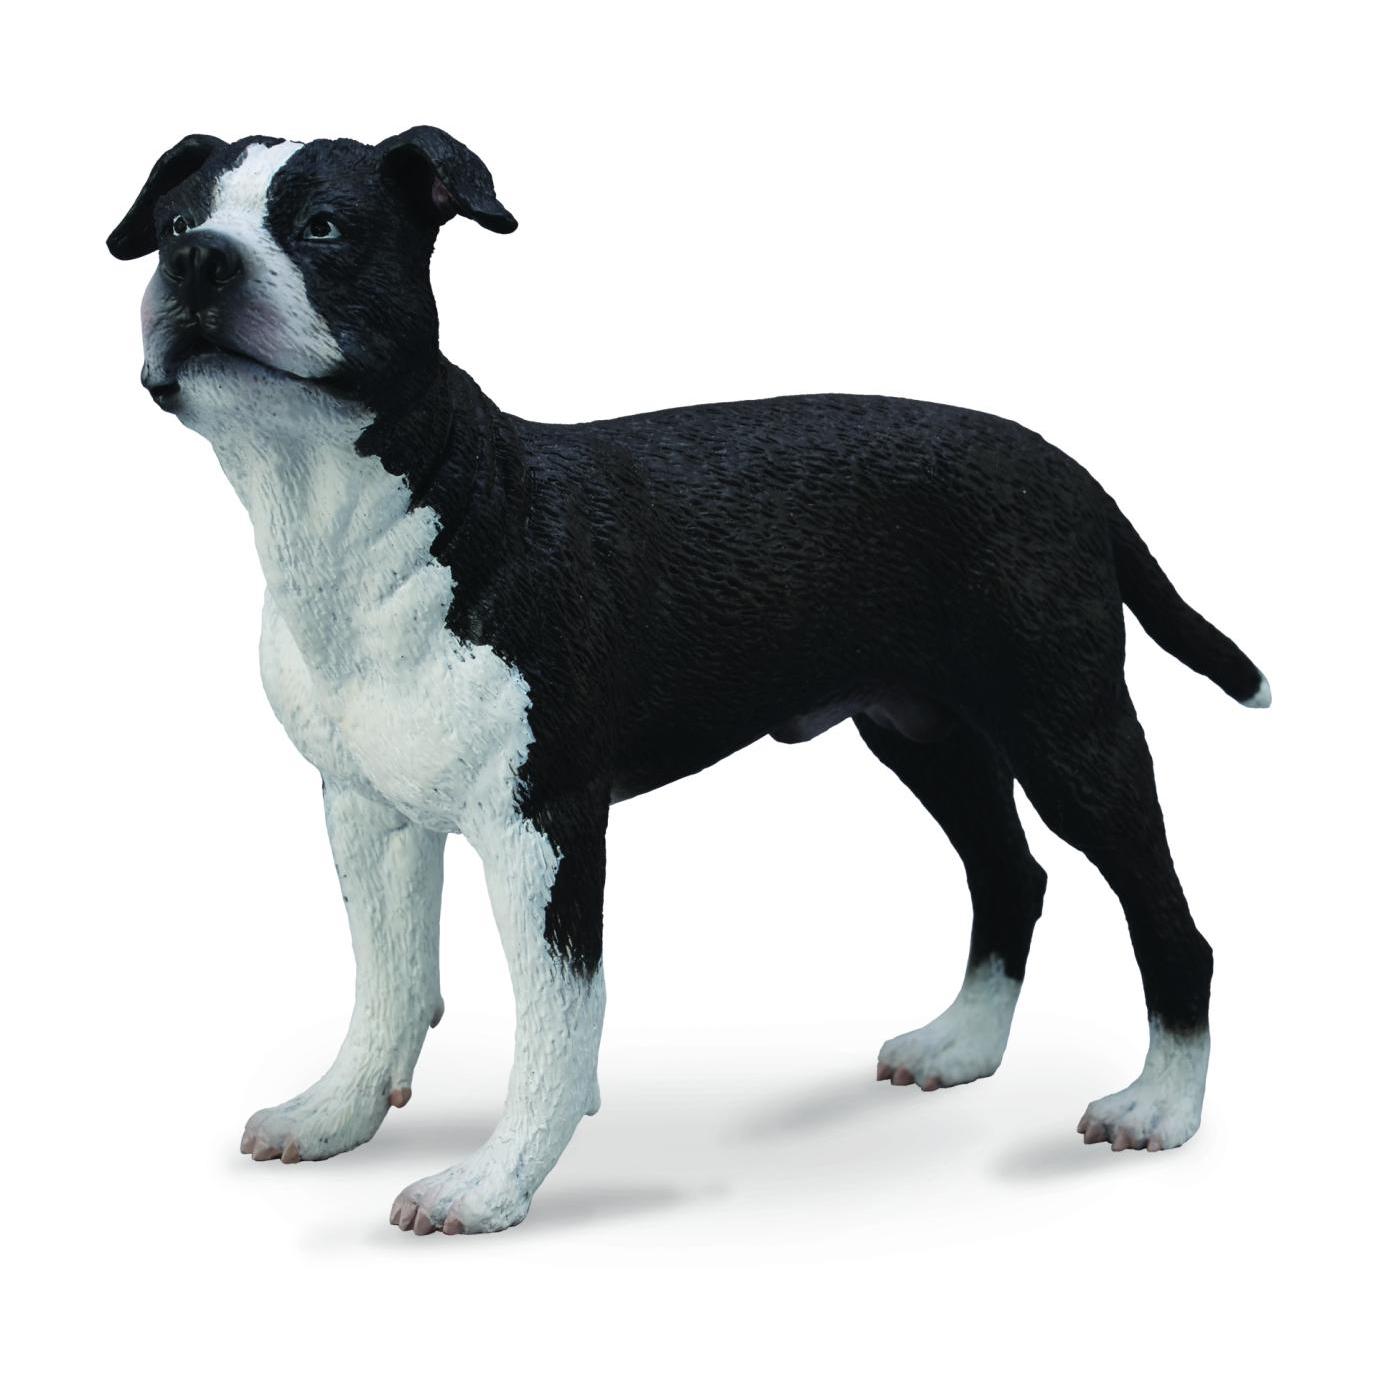 Фигурка - Стаффордширский терьер, размер LСобаки и щенки (Dogs &amp; Puppies)<br>Фигурка - Стаффордширский терьер, размер L<br>